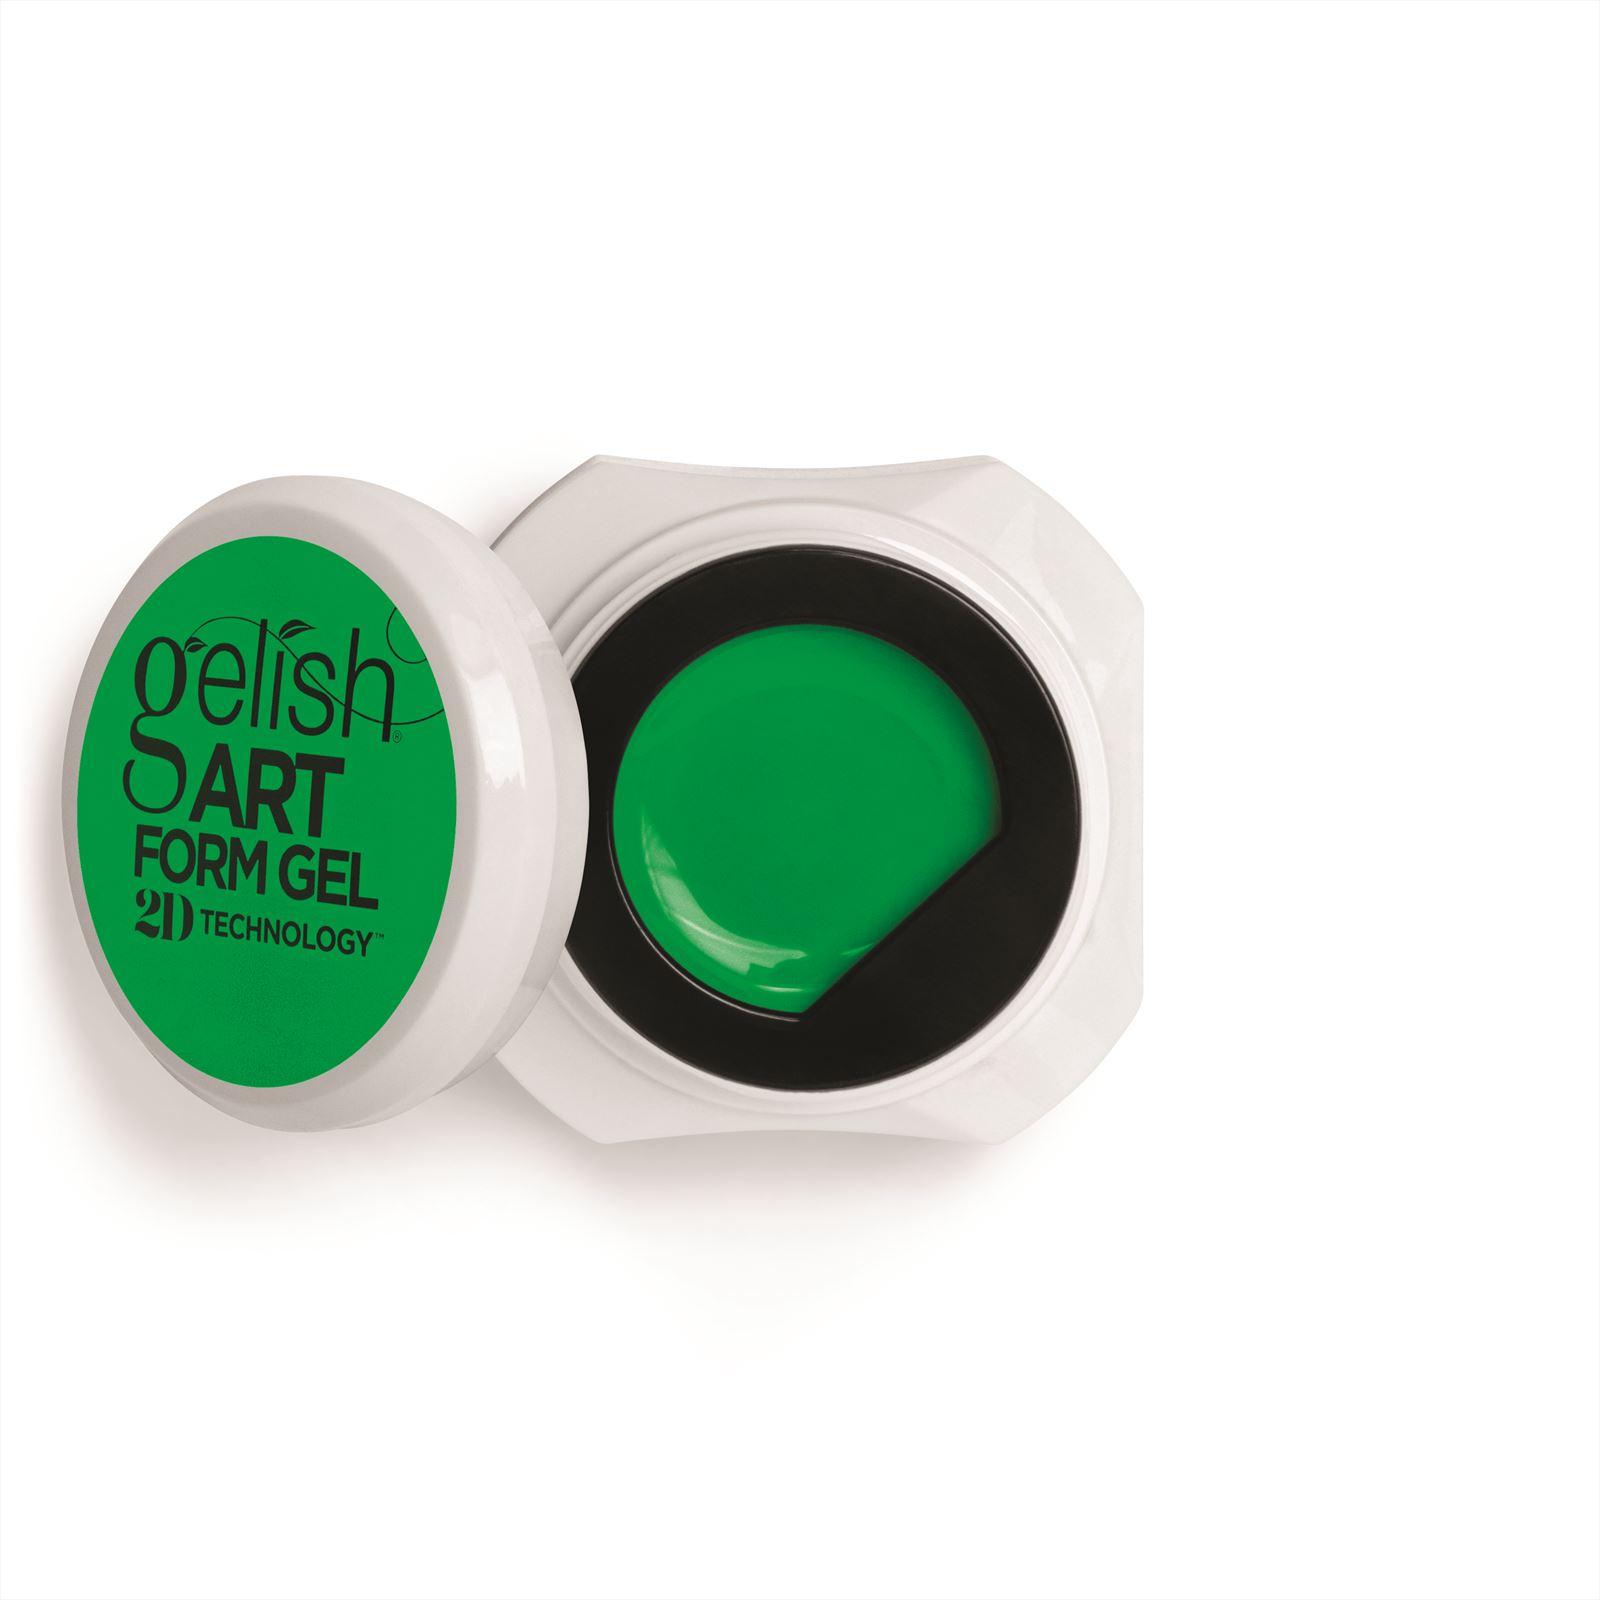 Afbeelding van Gelish 2D Artformgel Essential Green